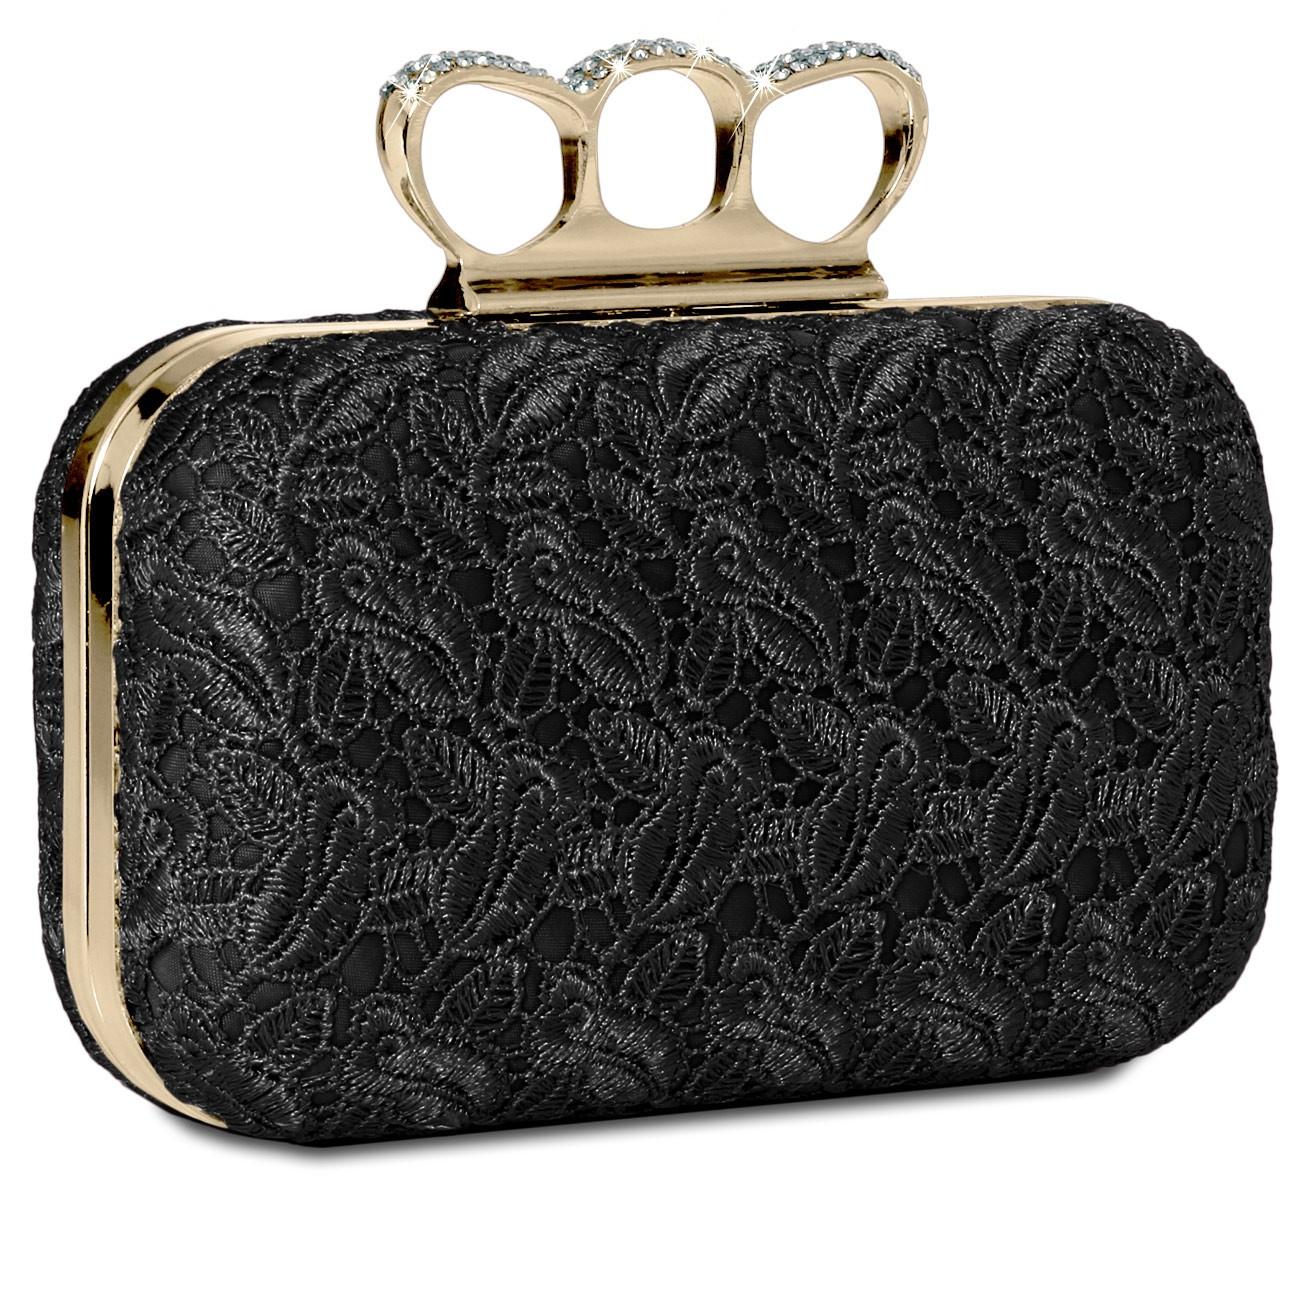 caspar damen schlagring box clutch abendtasche mit stoff. Black Bedroom Furniture Sets. Home Design Ideas